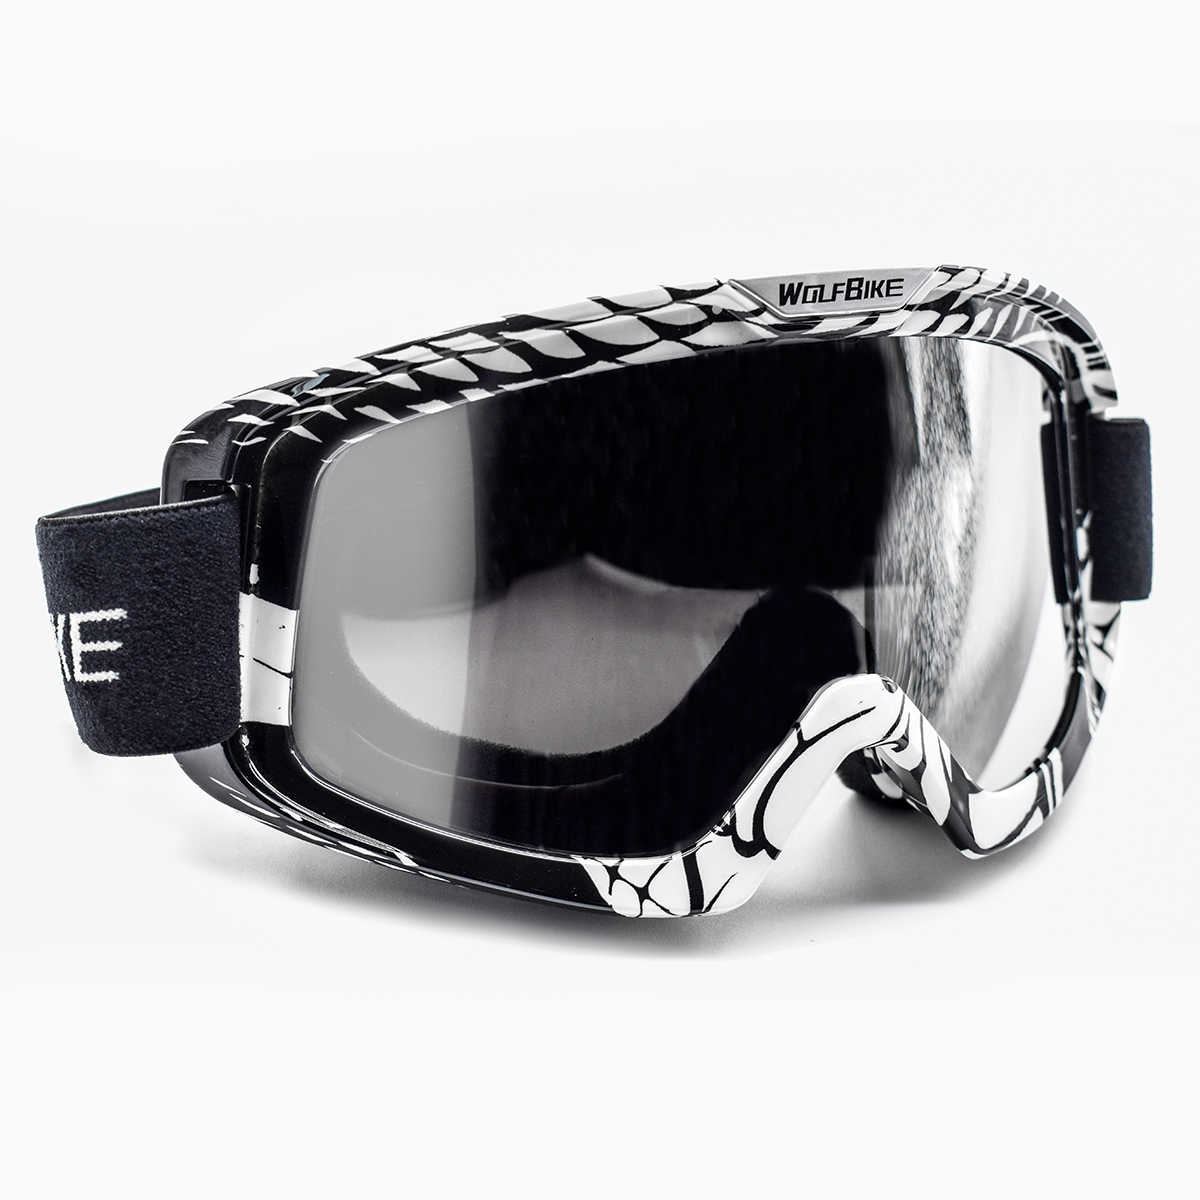 19456555b4e ... WOLFBIKE snowboarding Windproof Glasses Outdoor Ski Goggles Dustproof Snow  Men Women Motocross Goggles Mountain Skiing Eyewear ...